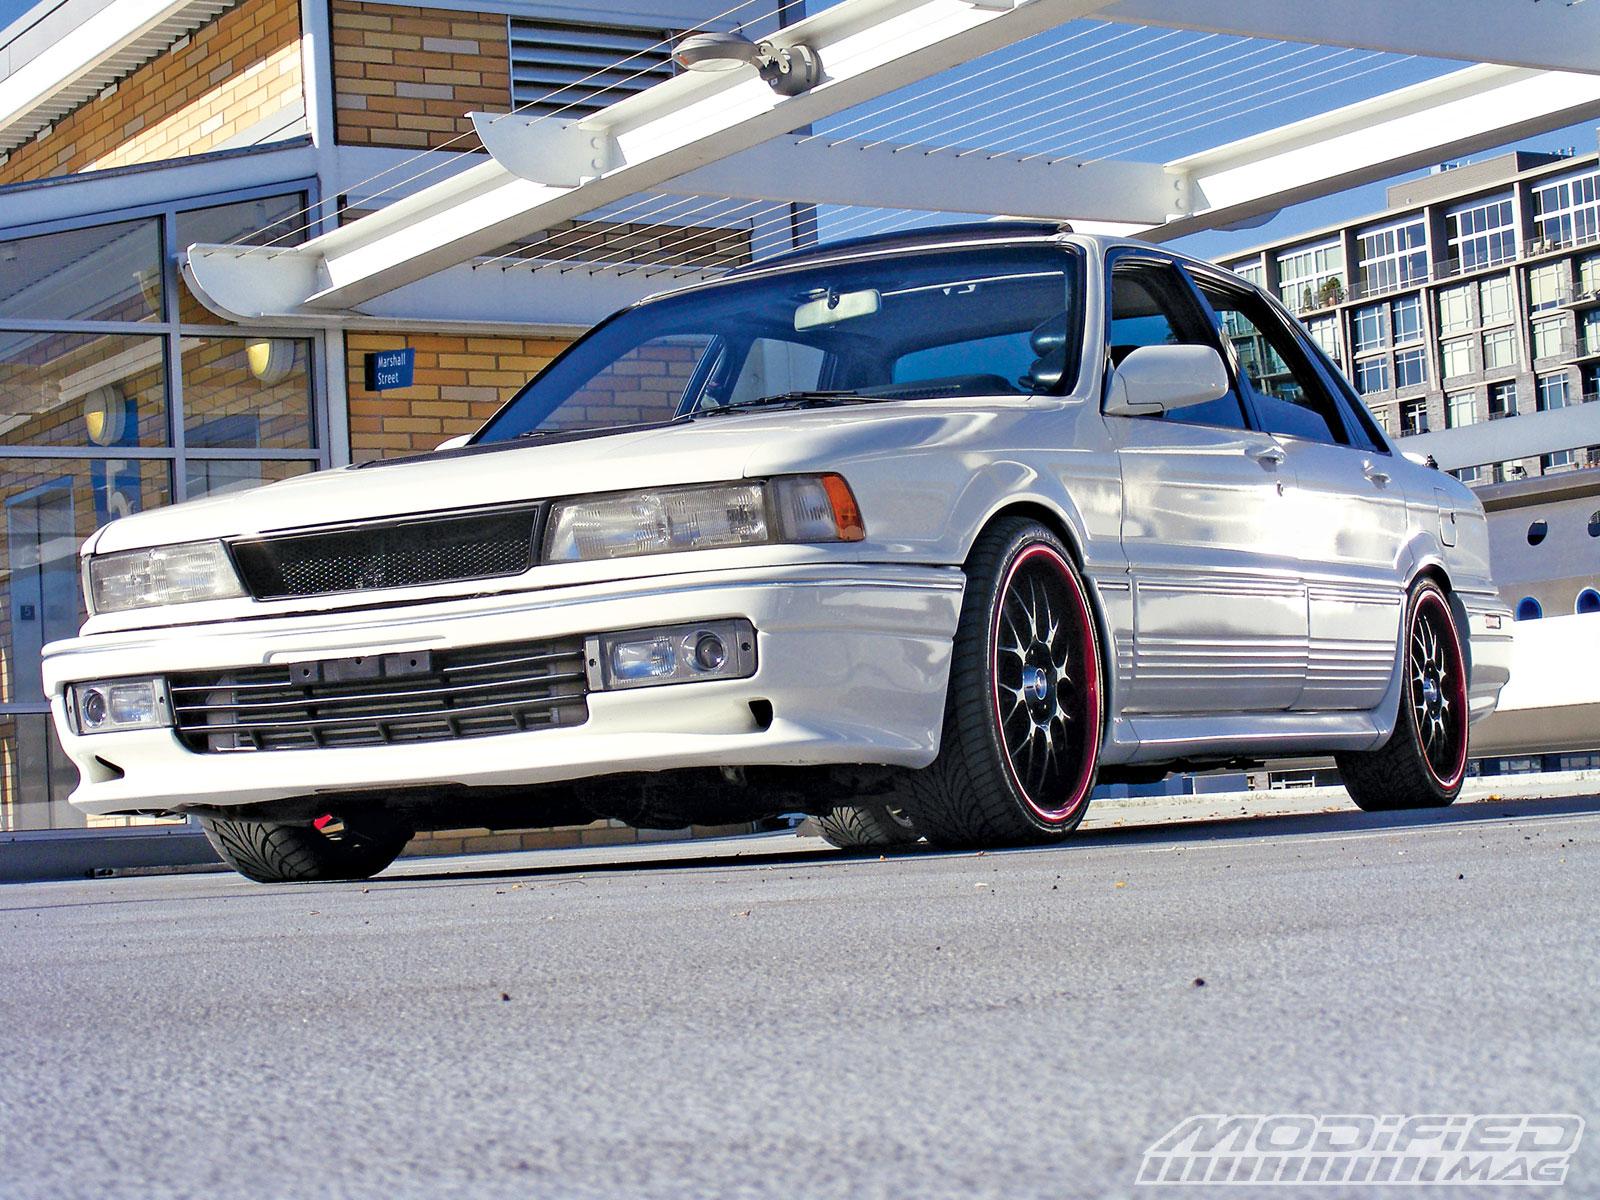 1992-mitsubishi-galant-vr-4-front-view_7e46d.jpg